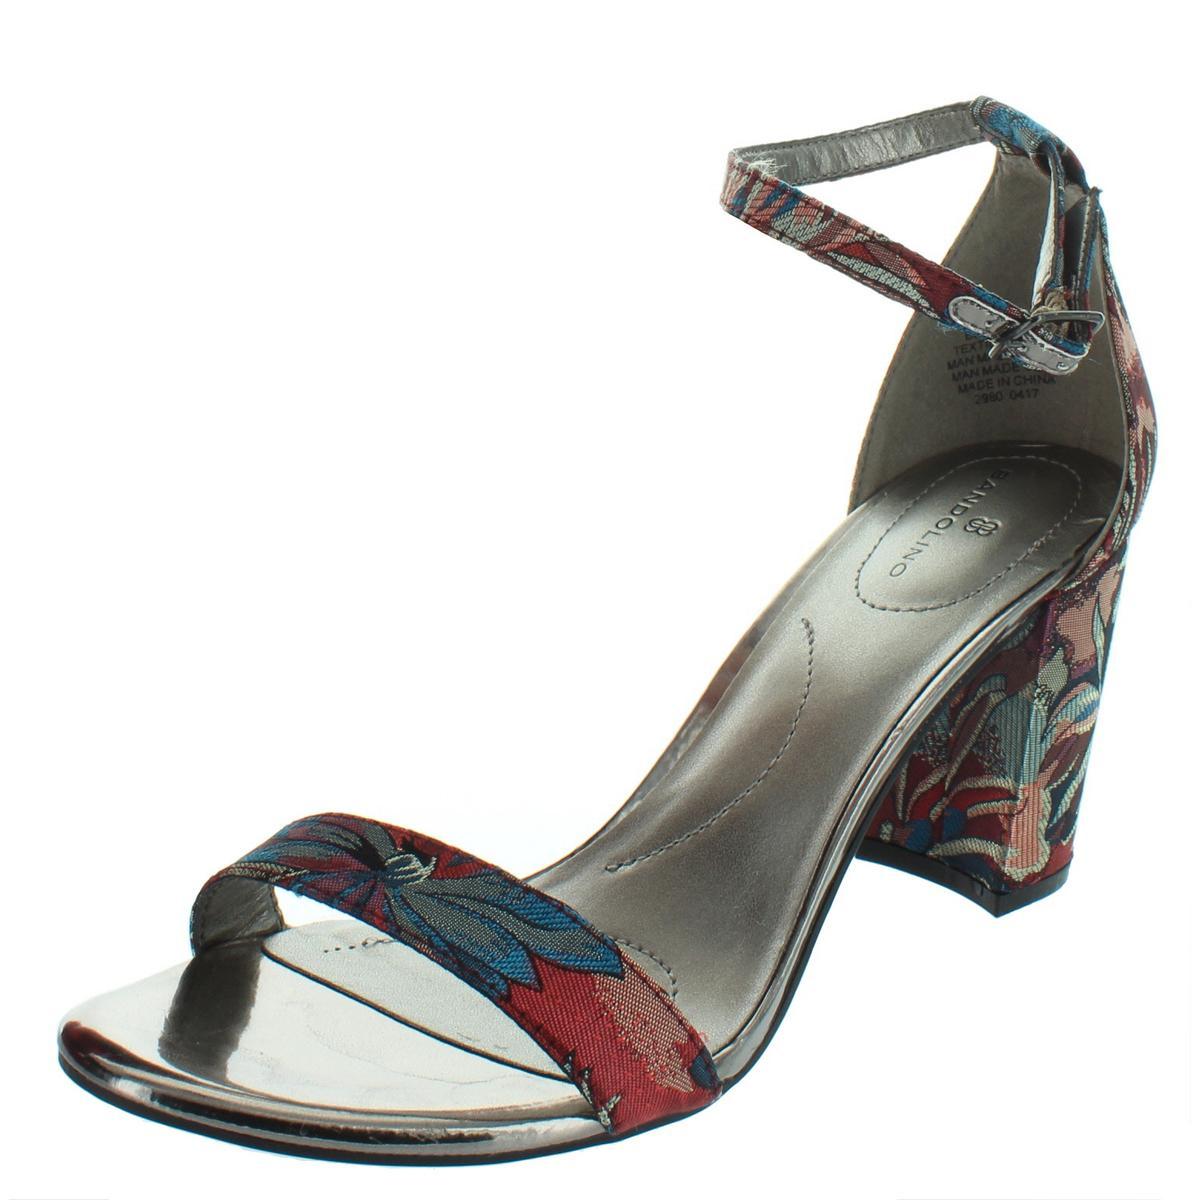 5ae51d1c7fed Details about Bandolino Womens Armory Blue Dress Sandals Shoes 8 Medium  (B